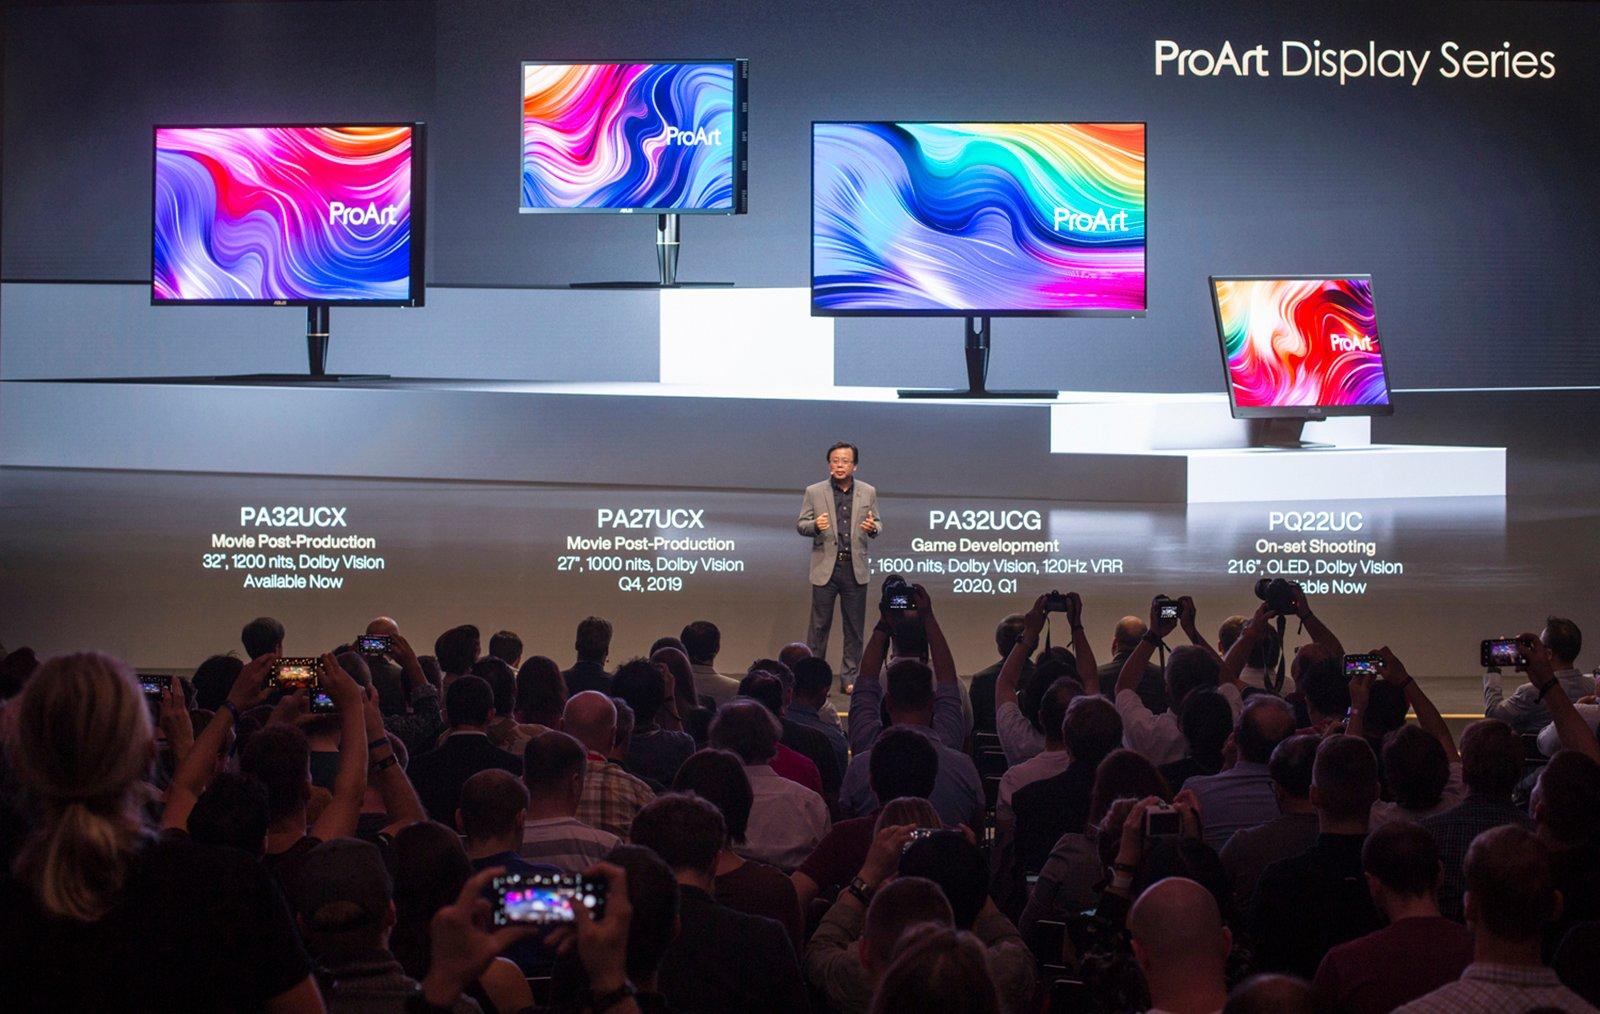 ASUS' New 1600-nit 4K ProArt Display Challenges Apple's Pro